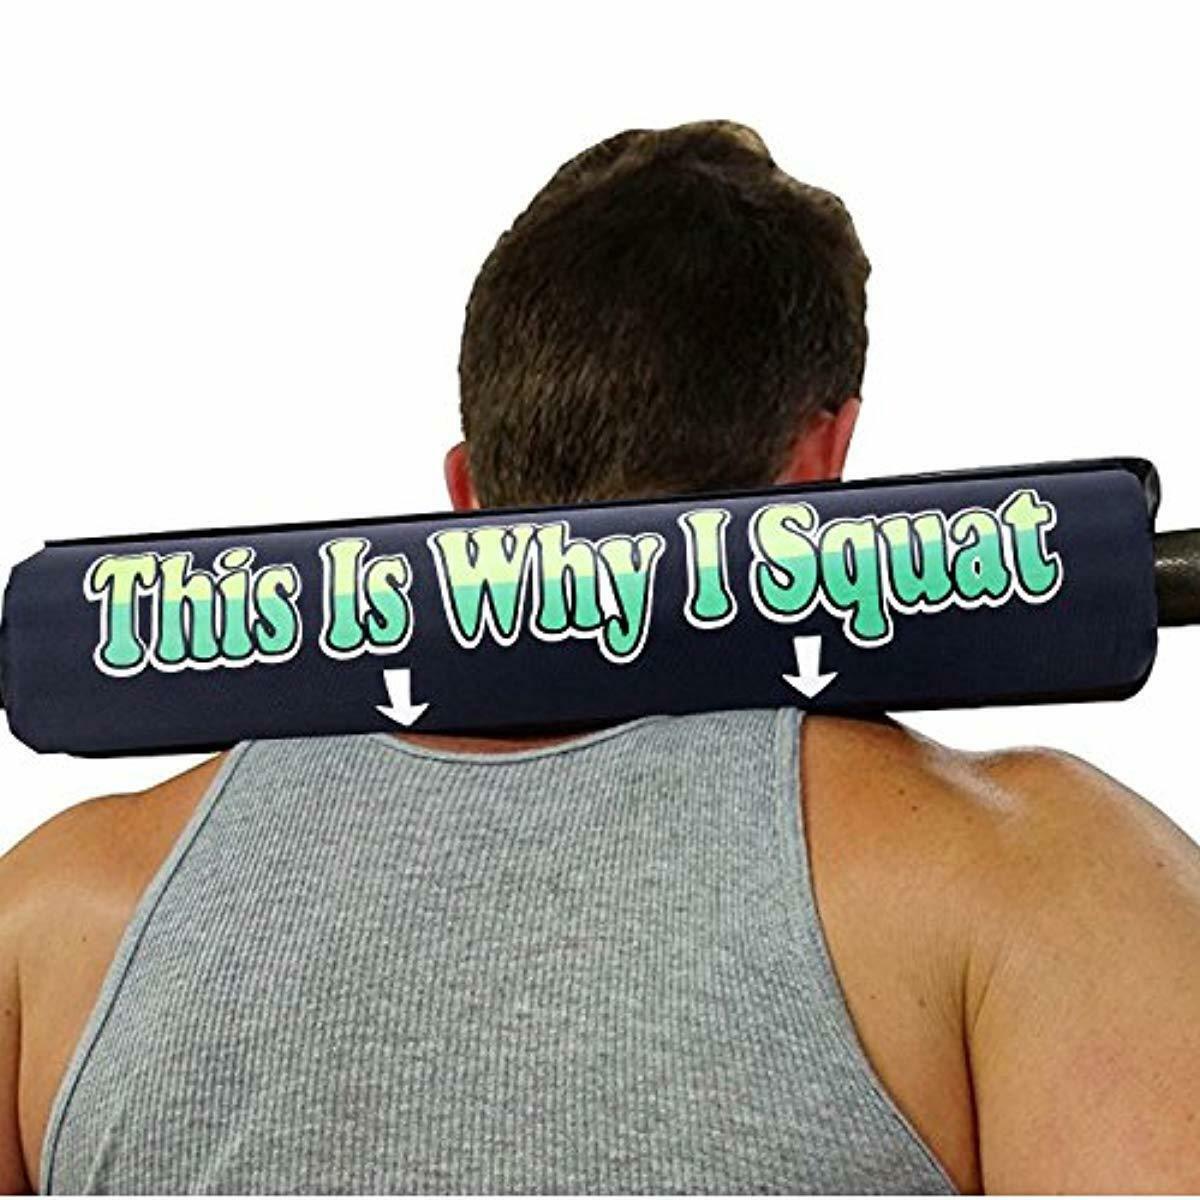 Gym Squat Rack Accessories I Bar Pad Neck Sponge de Aser Eje